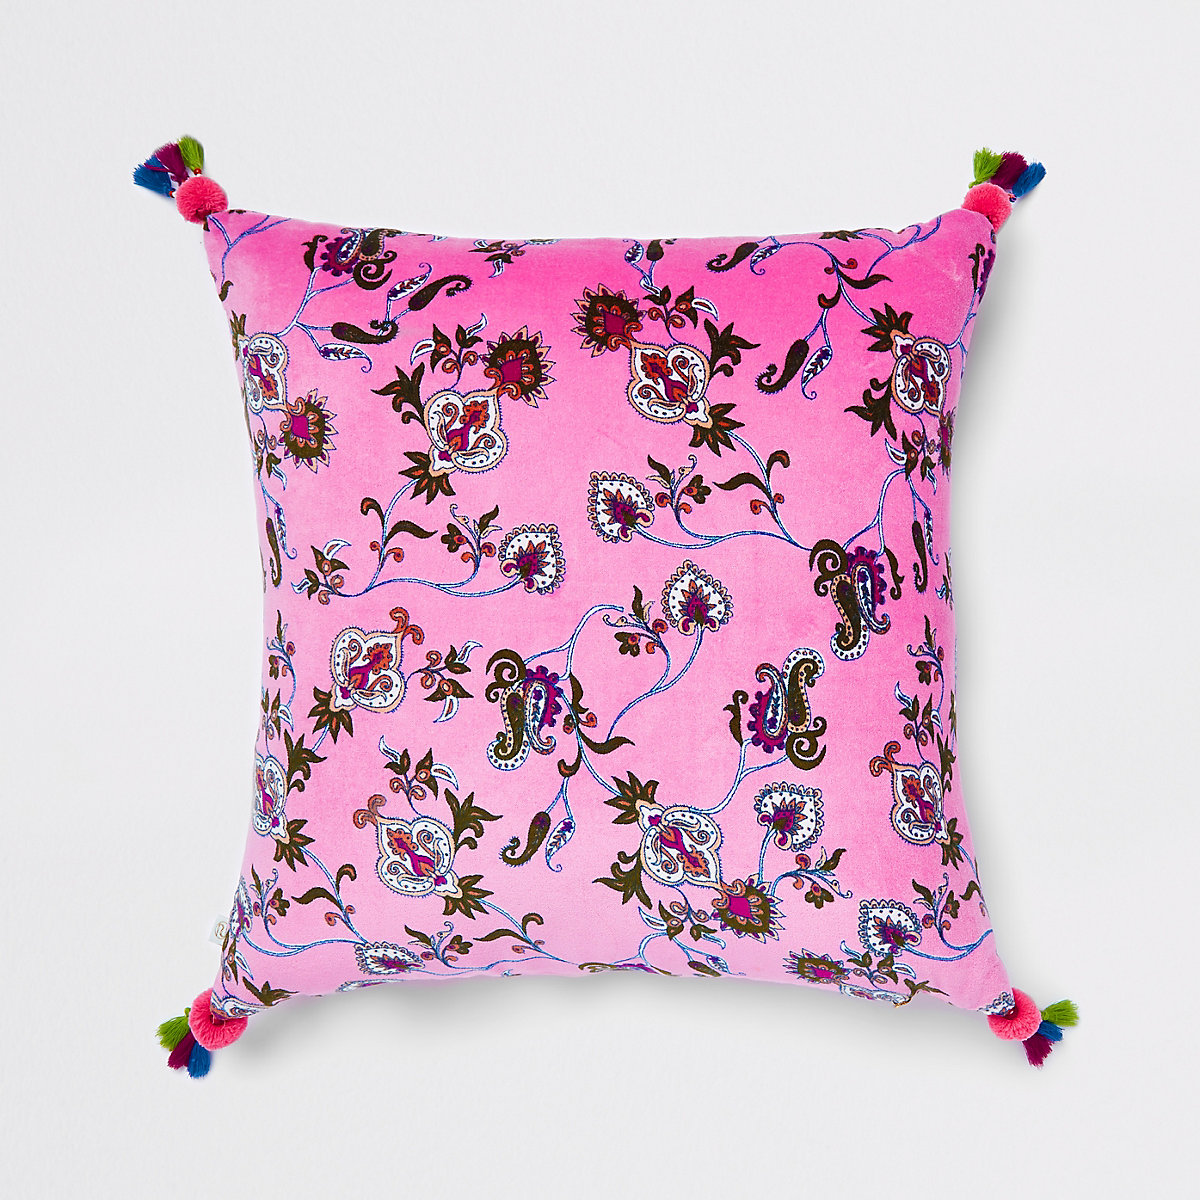 Pink floral velvet cushion